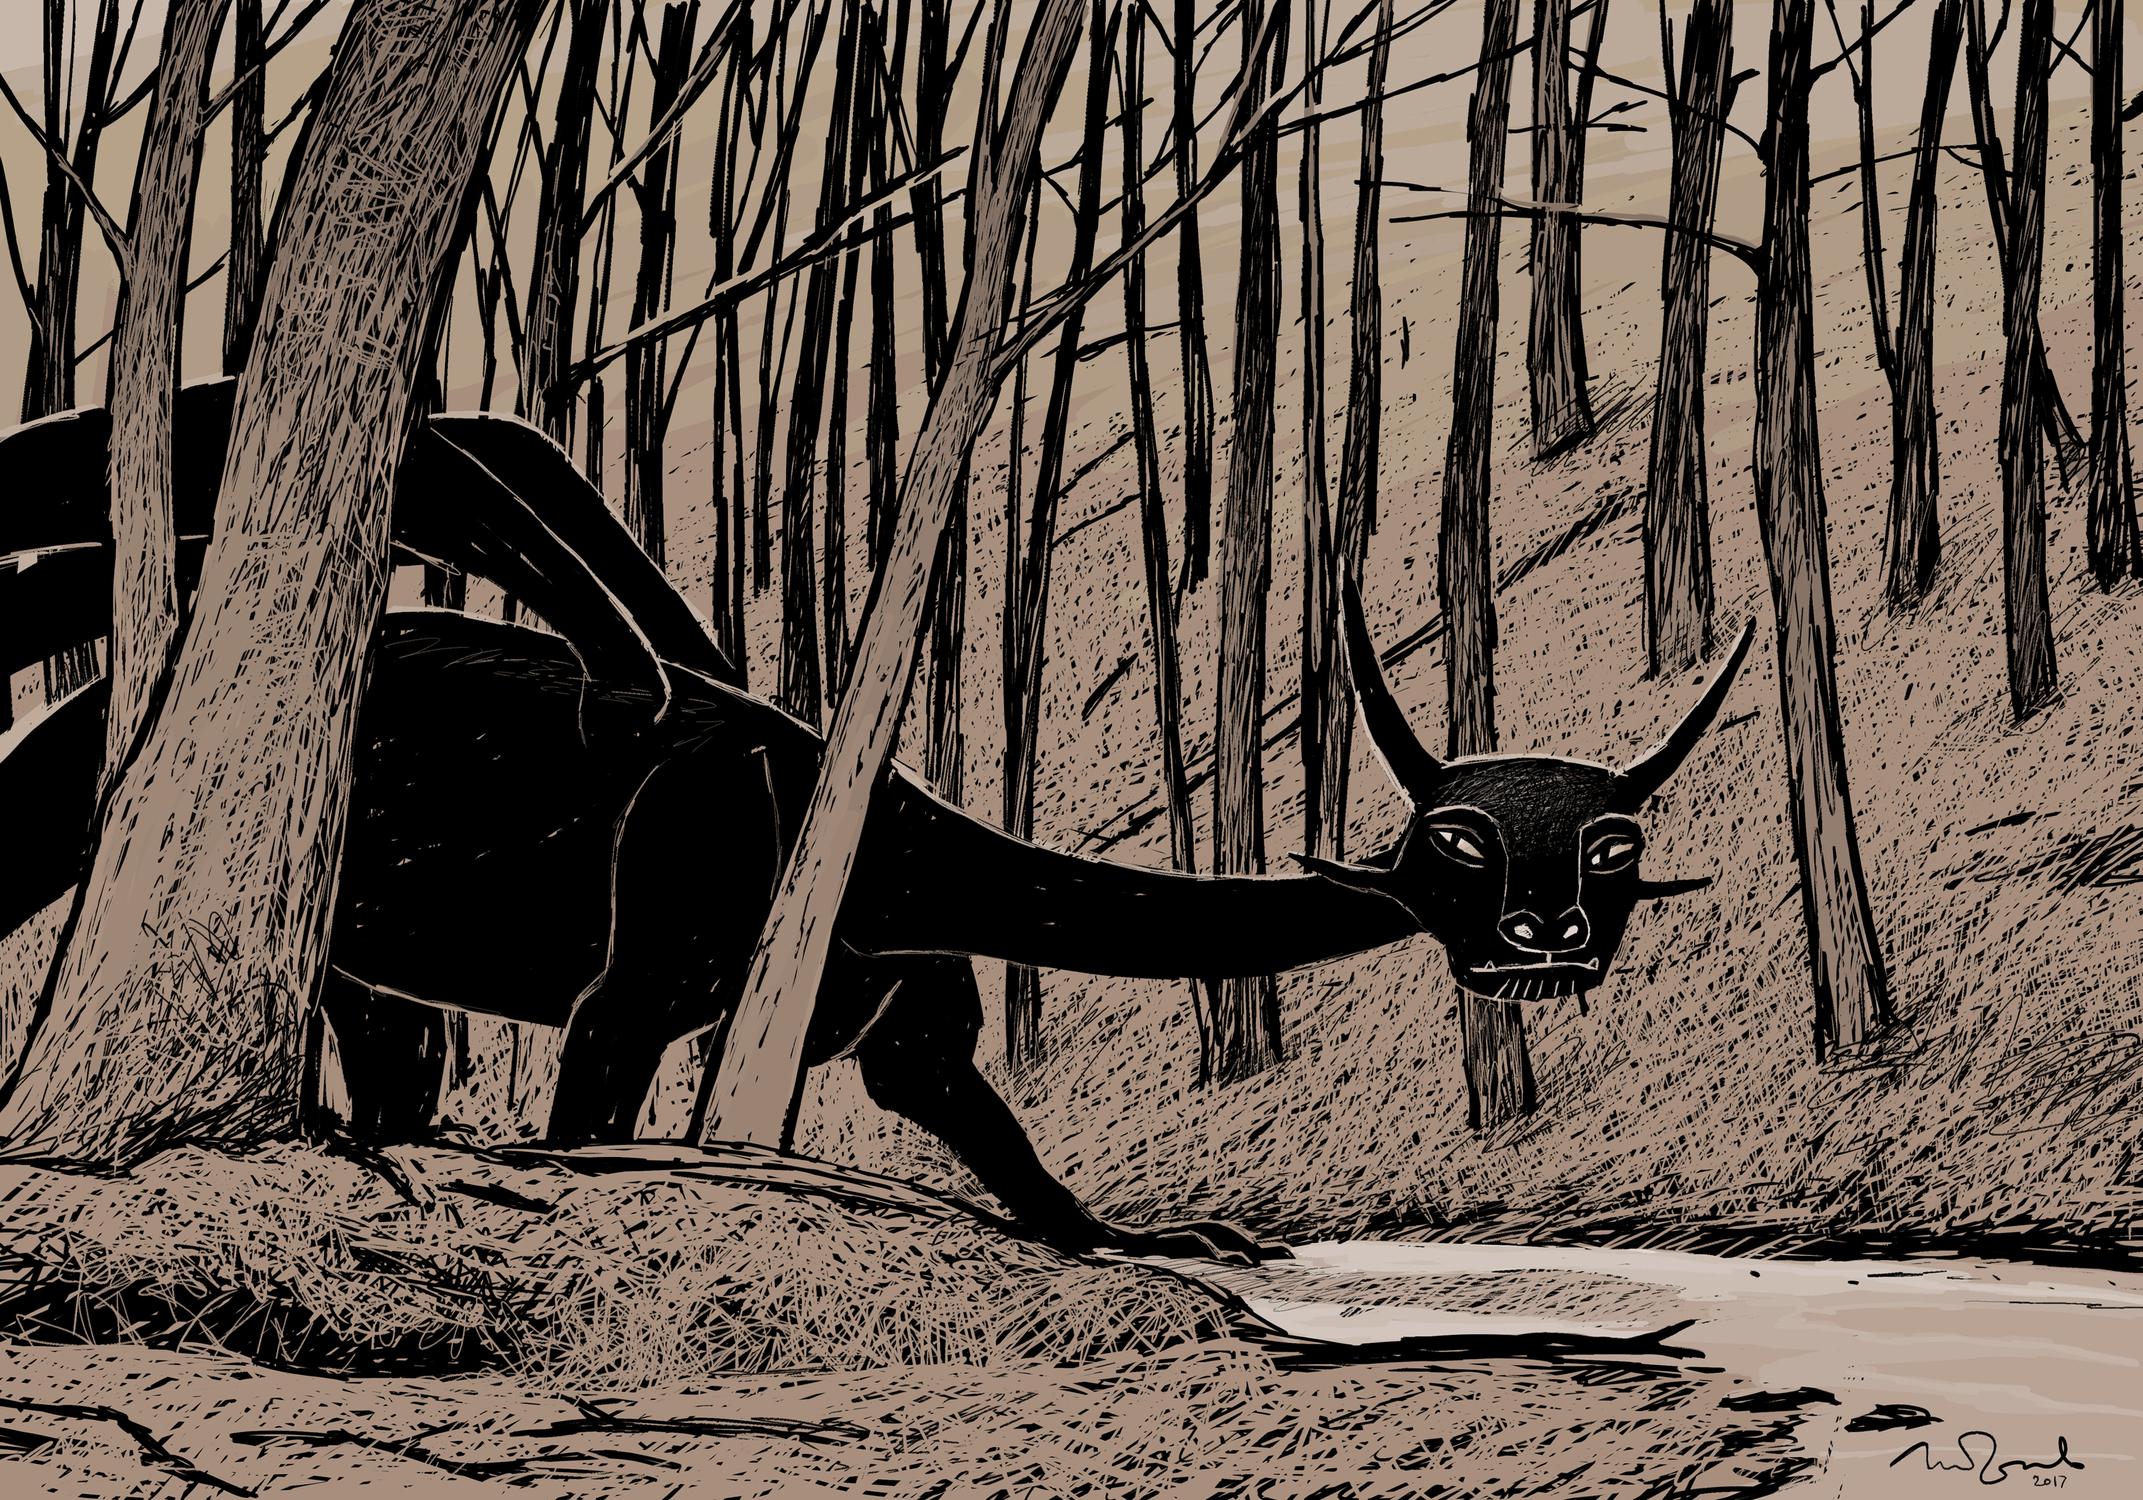 Dragon Artwork by Penko Gelev